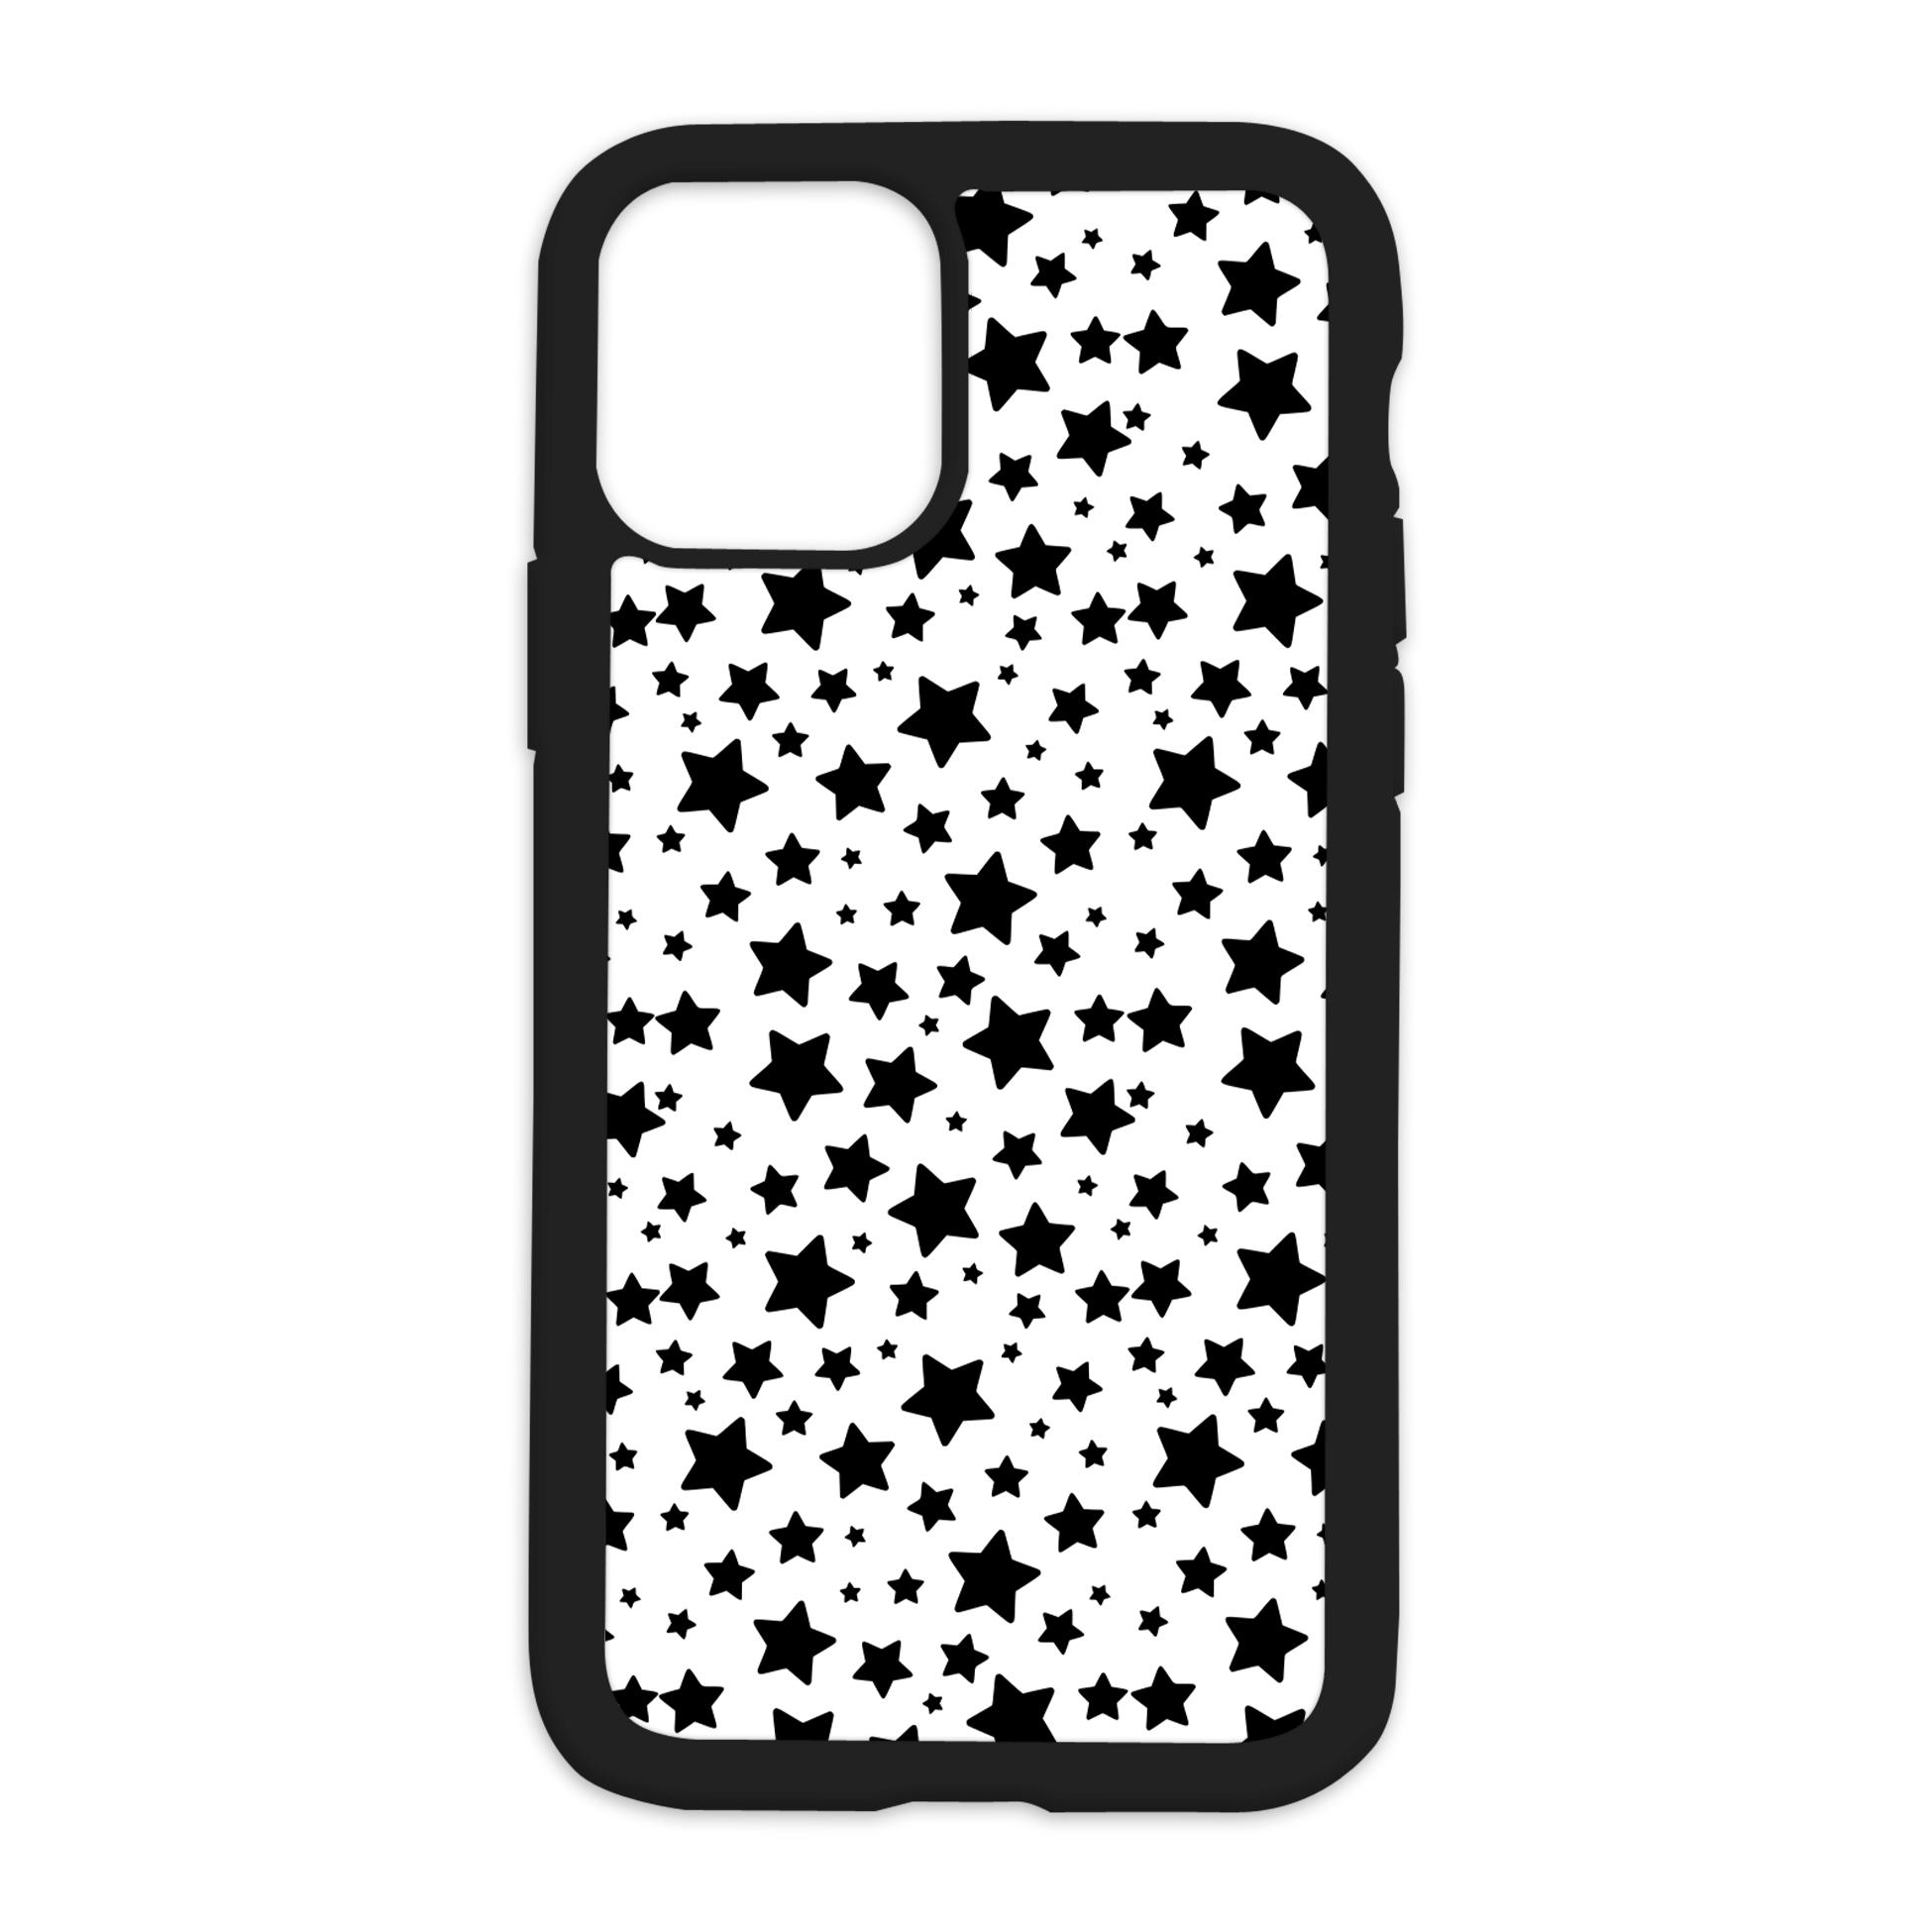 Stars Pattern Design On Black Phone Case - 7/8+ / Black